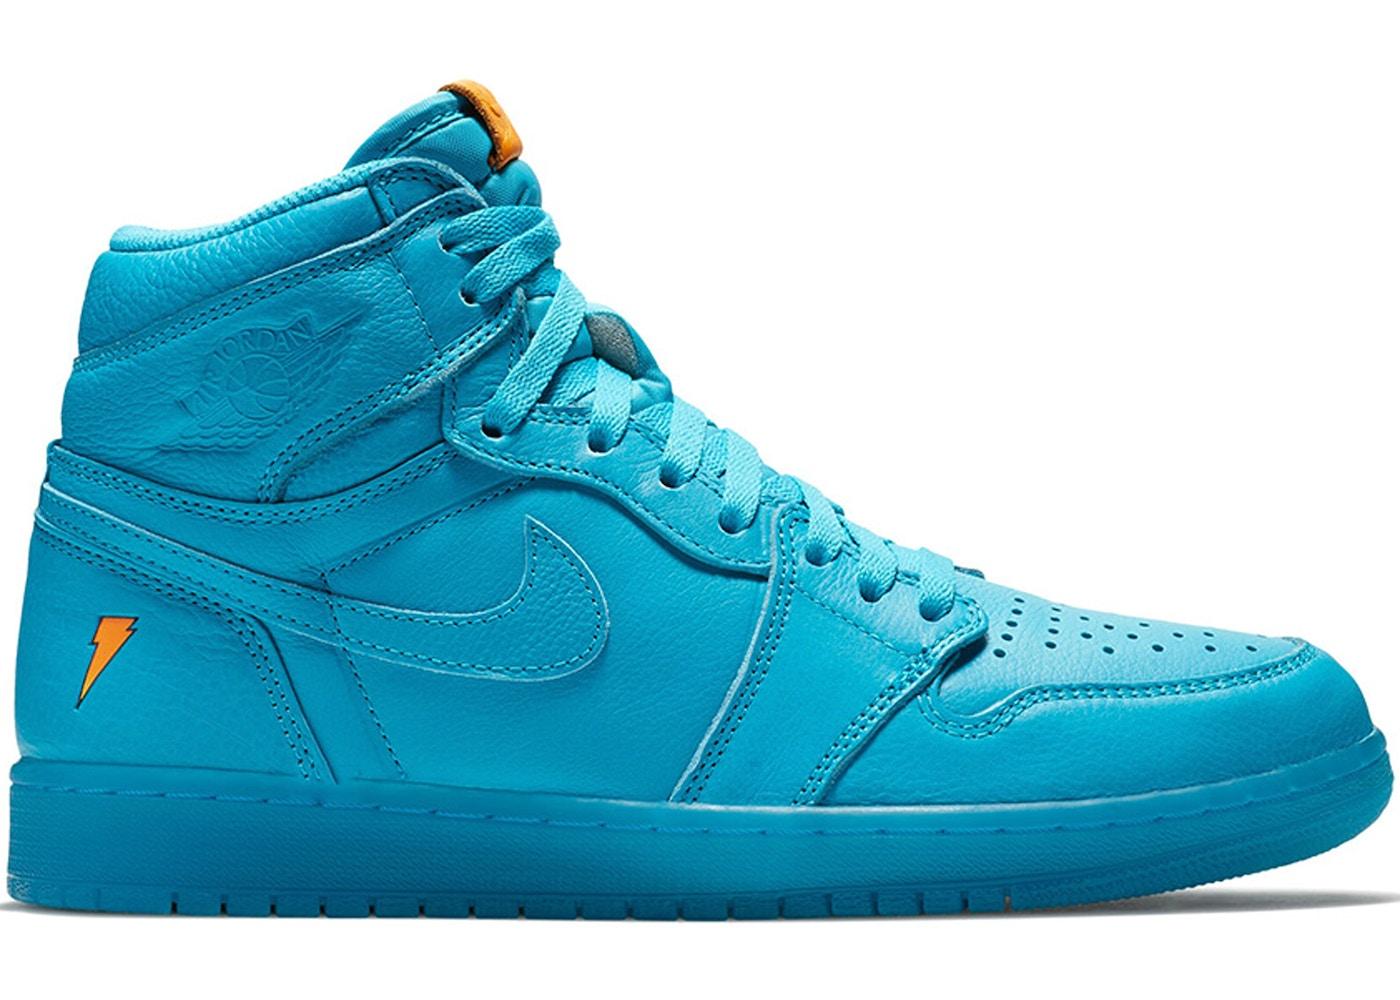 buy popular c378c b770b mint green orange air jordan retro 17 sky blue silver Air Jordan 6 Buy Air  Jordan 1 Shoes Deadstock Sneakers ...